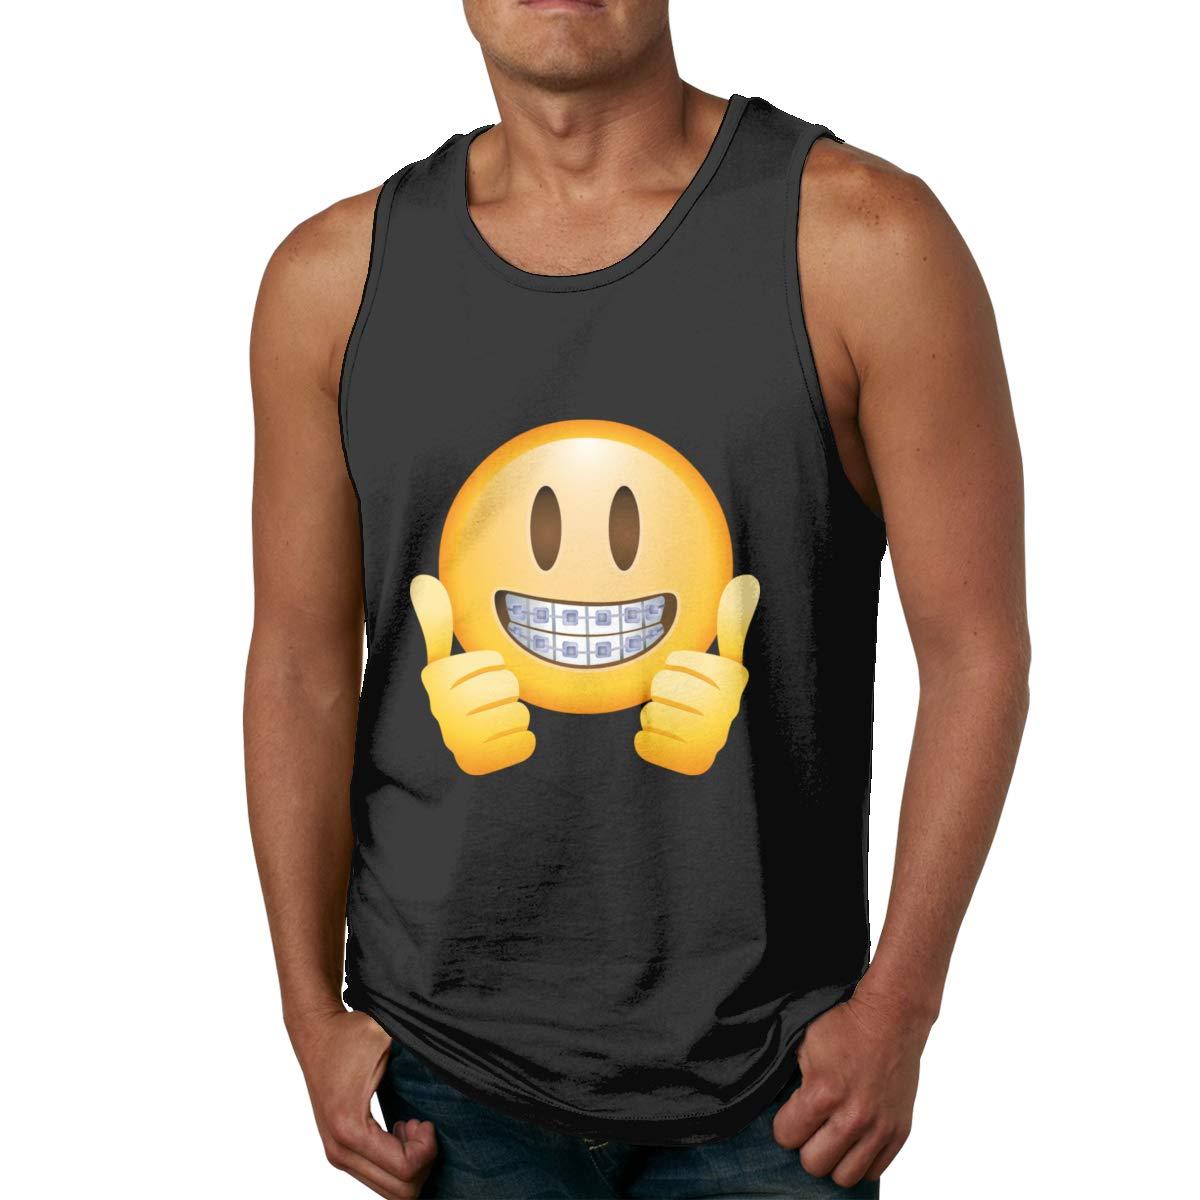 Seuriamin Thumbs Up Emoji S Humor Running Sleeveless Tank Top T Shirts